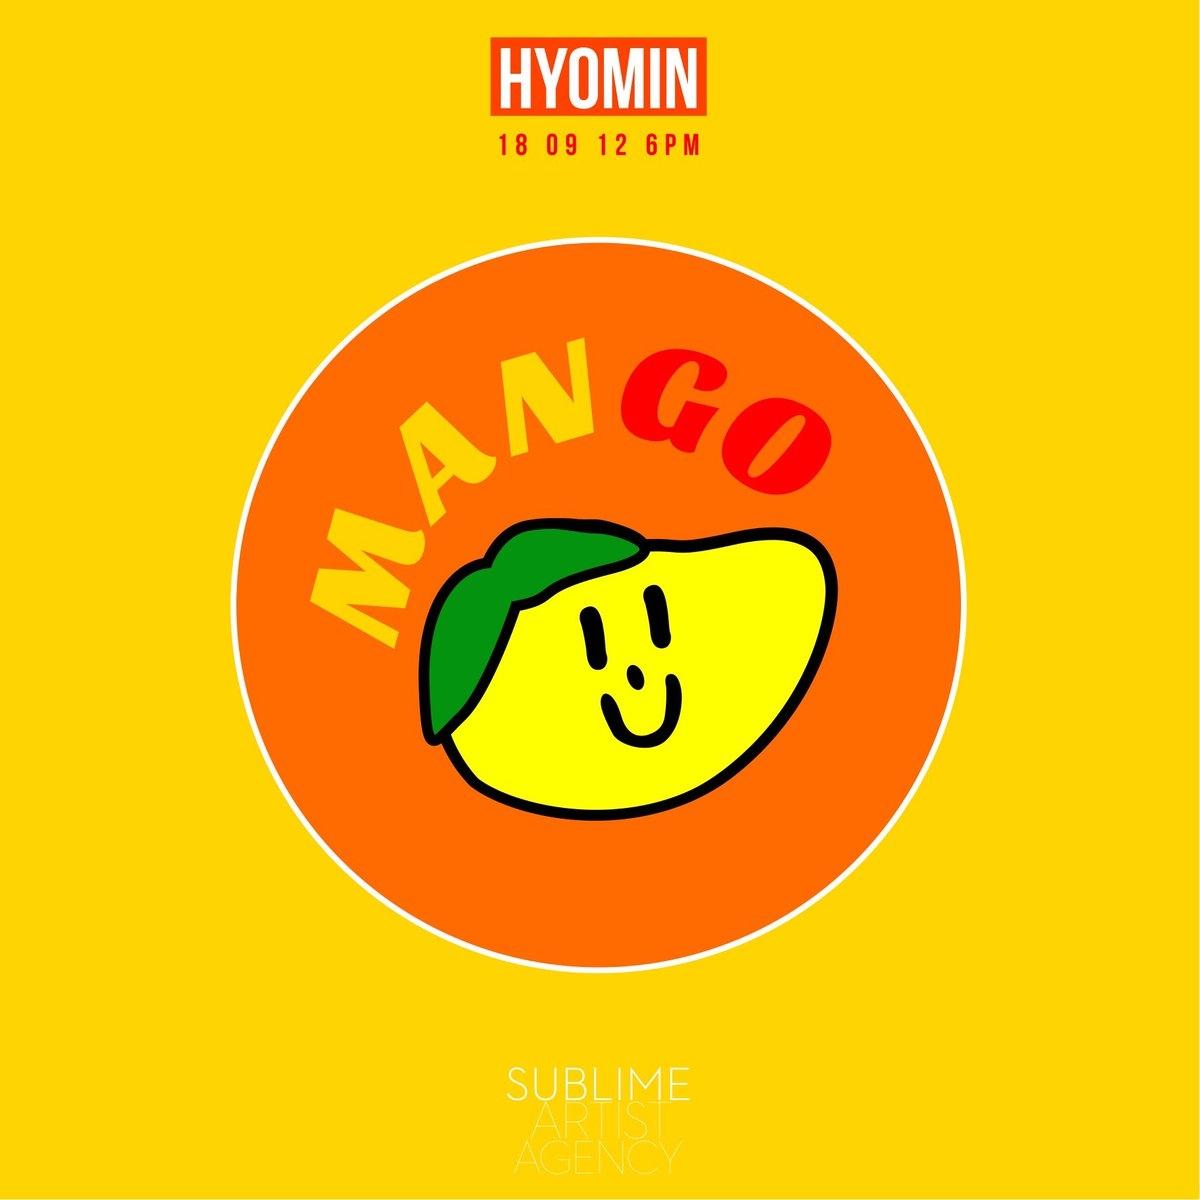 T-ara Hyomin Mango teaser 1